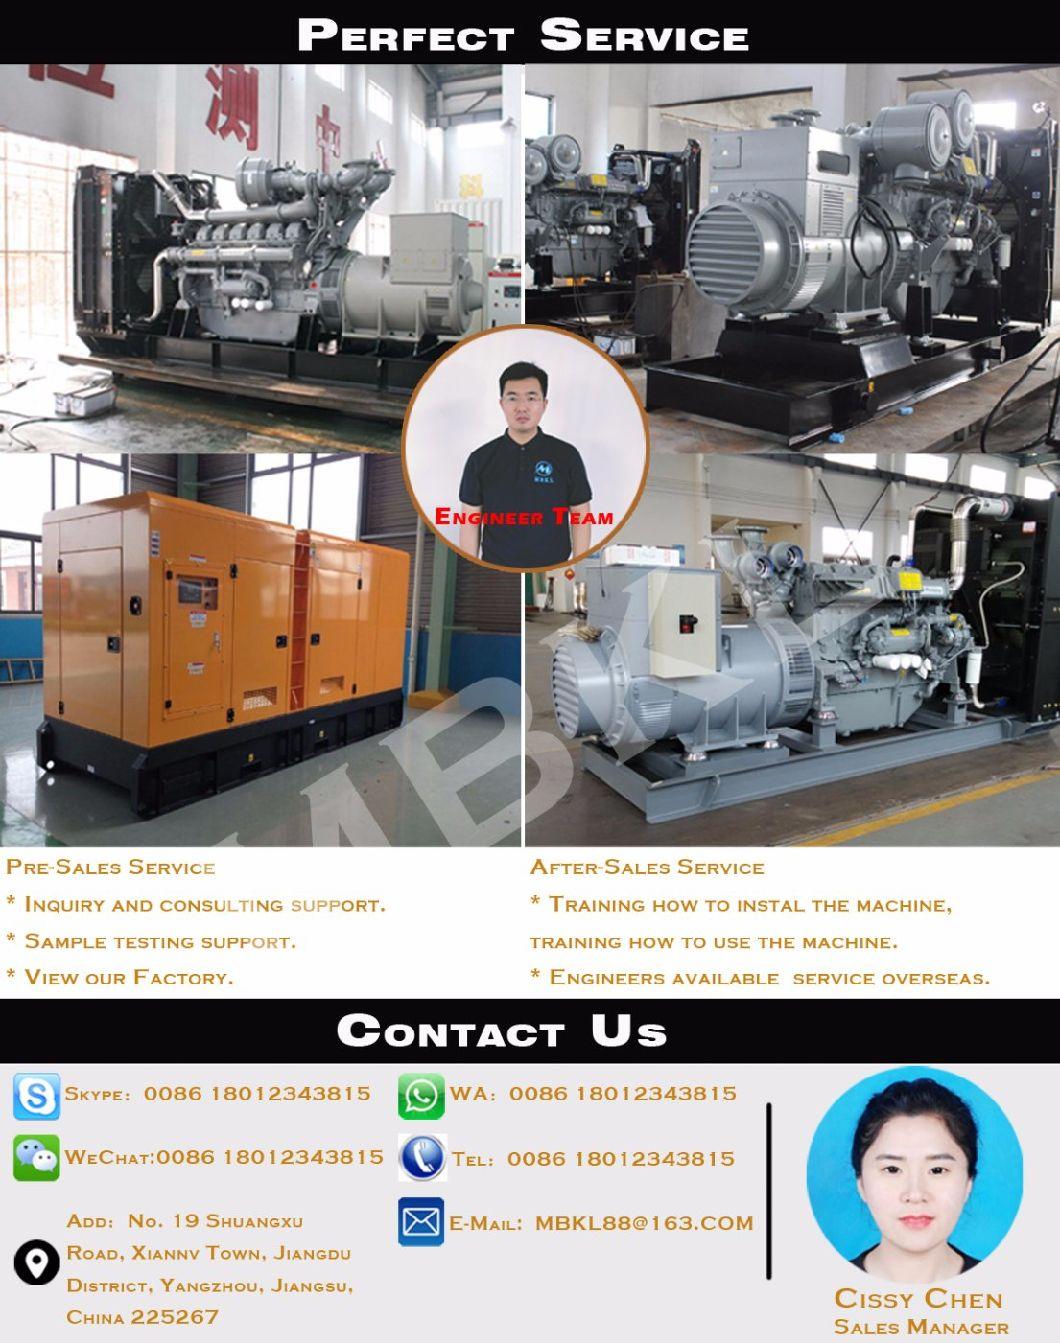 High Quality New Design Japan Original Mitsubishi Engine 1360kw/1700kVA Diesel Generator for Sale S16r-Pta